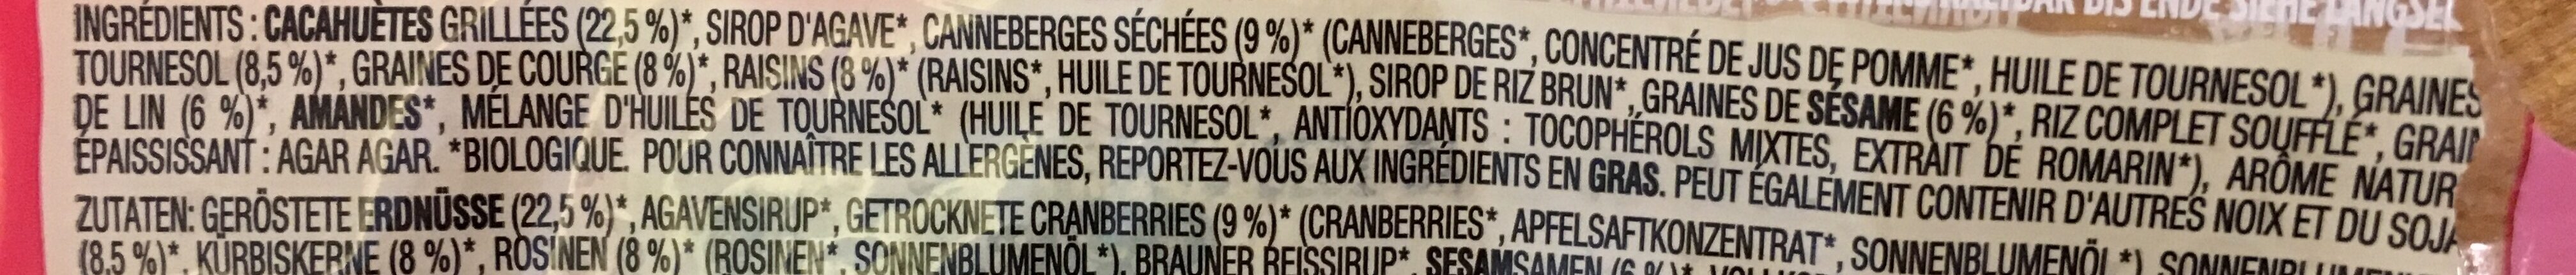 Nature Cranberry Organic Fruit & Nut Bar - Ingrediënten - fr